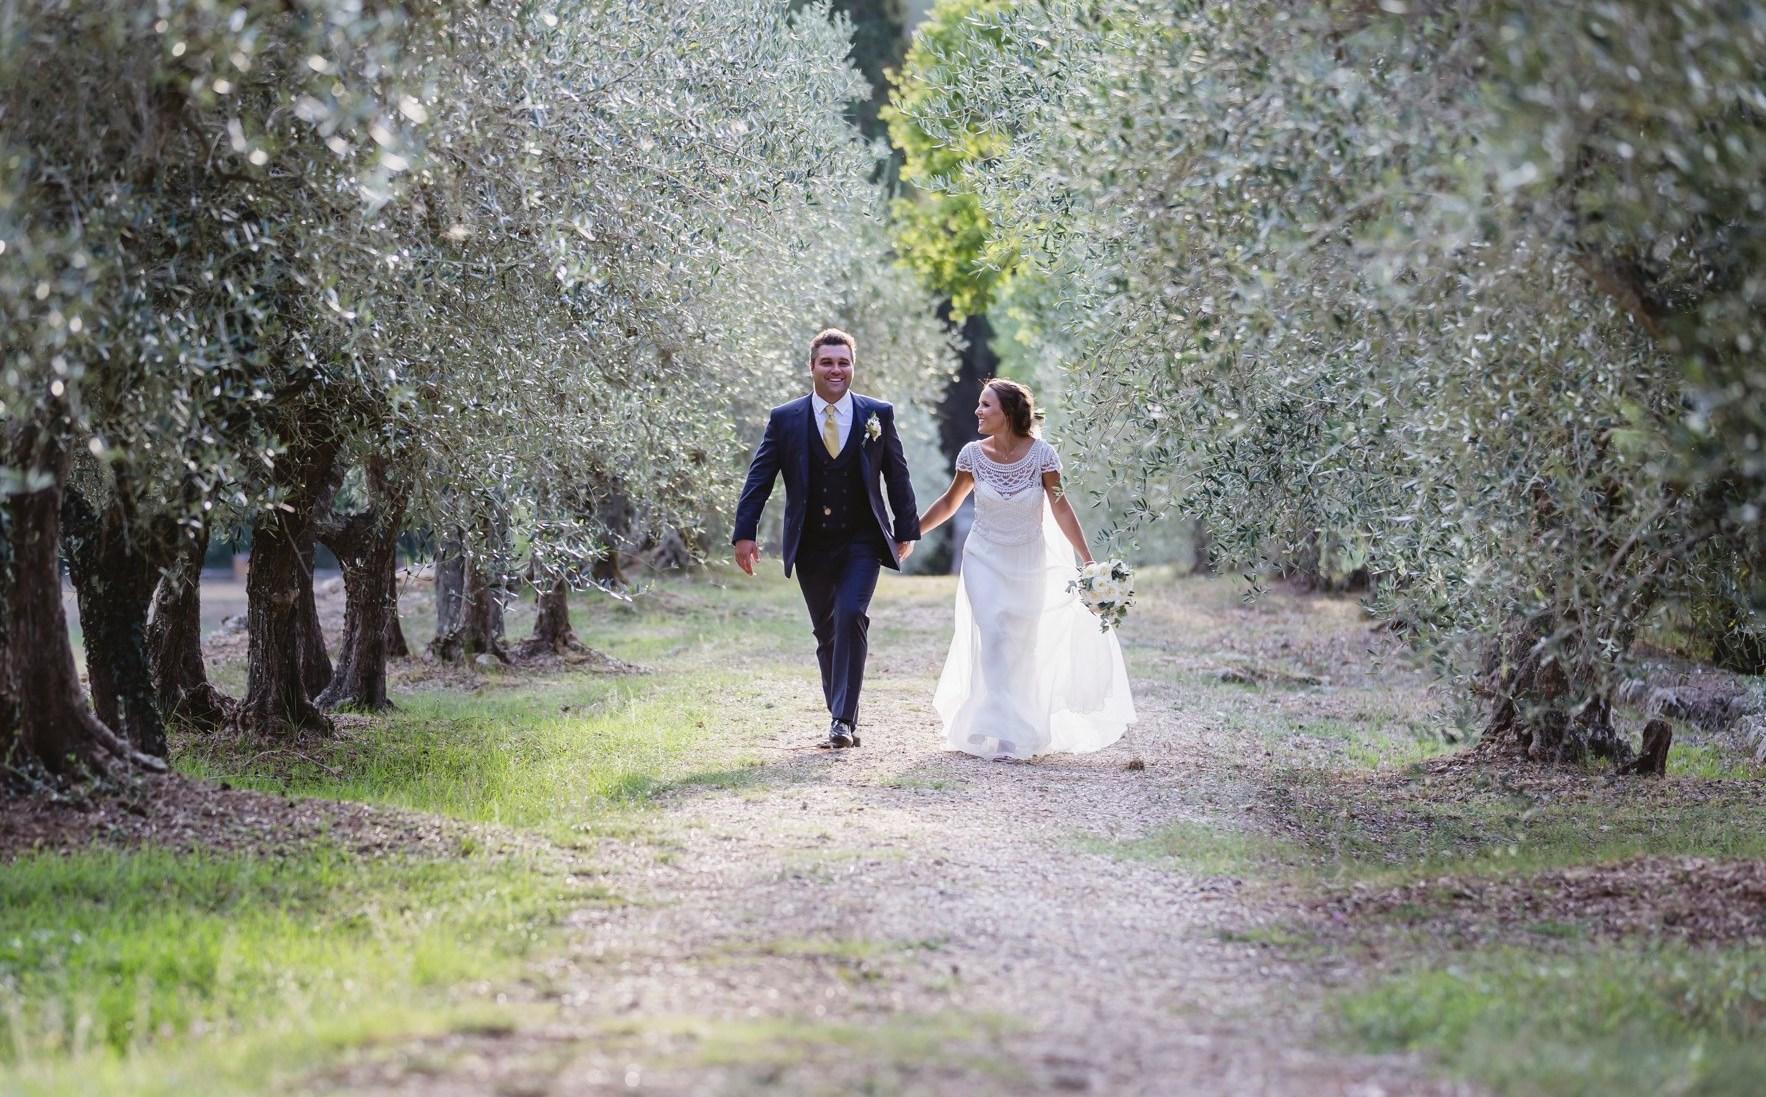 elope to Tuscany